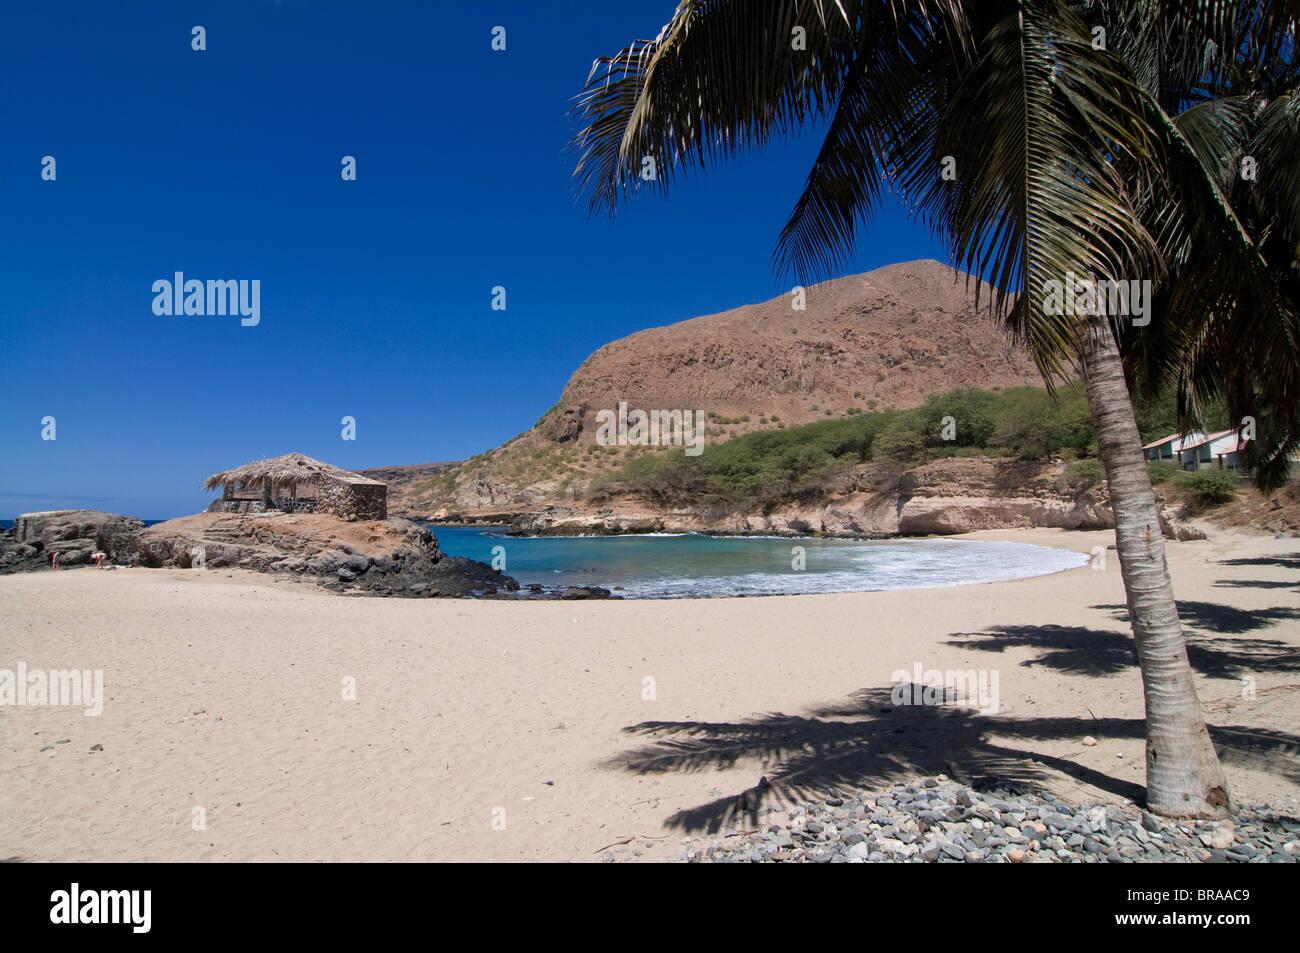 Sandstrand mit Palmen und Felsen, Tarrafal, Santiago, Kapverdische Inseln, Atlantik, Afrika Stockbild